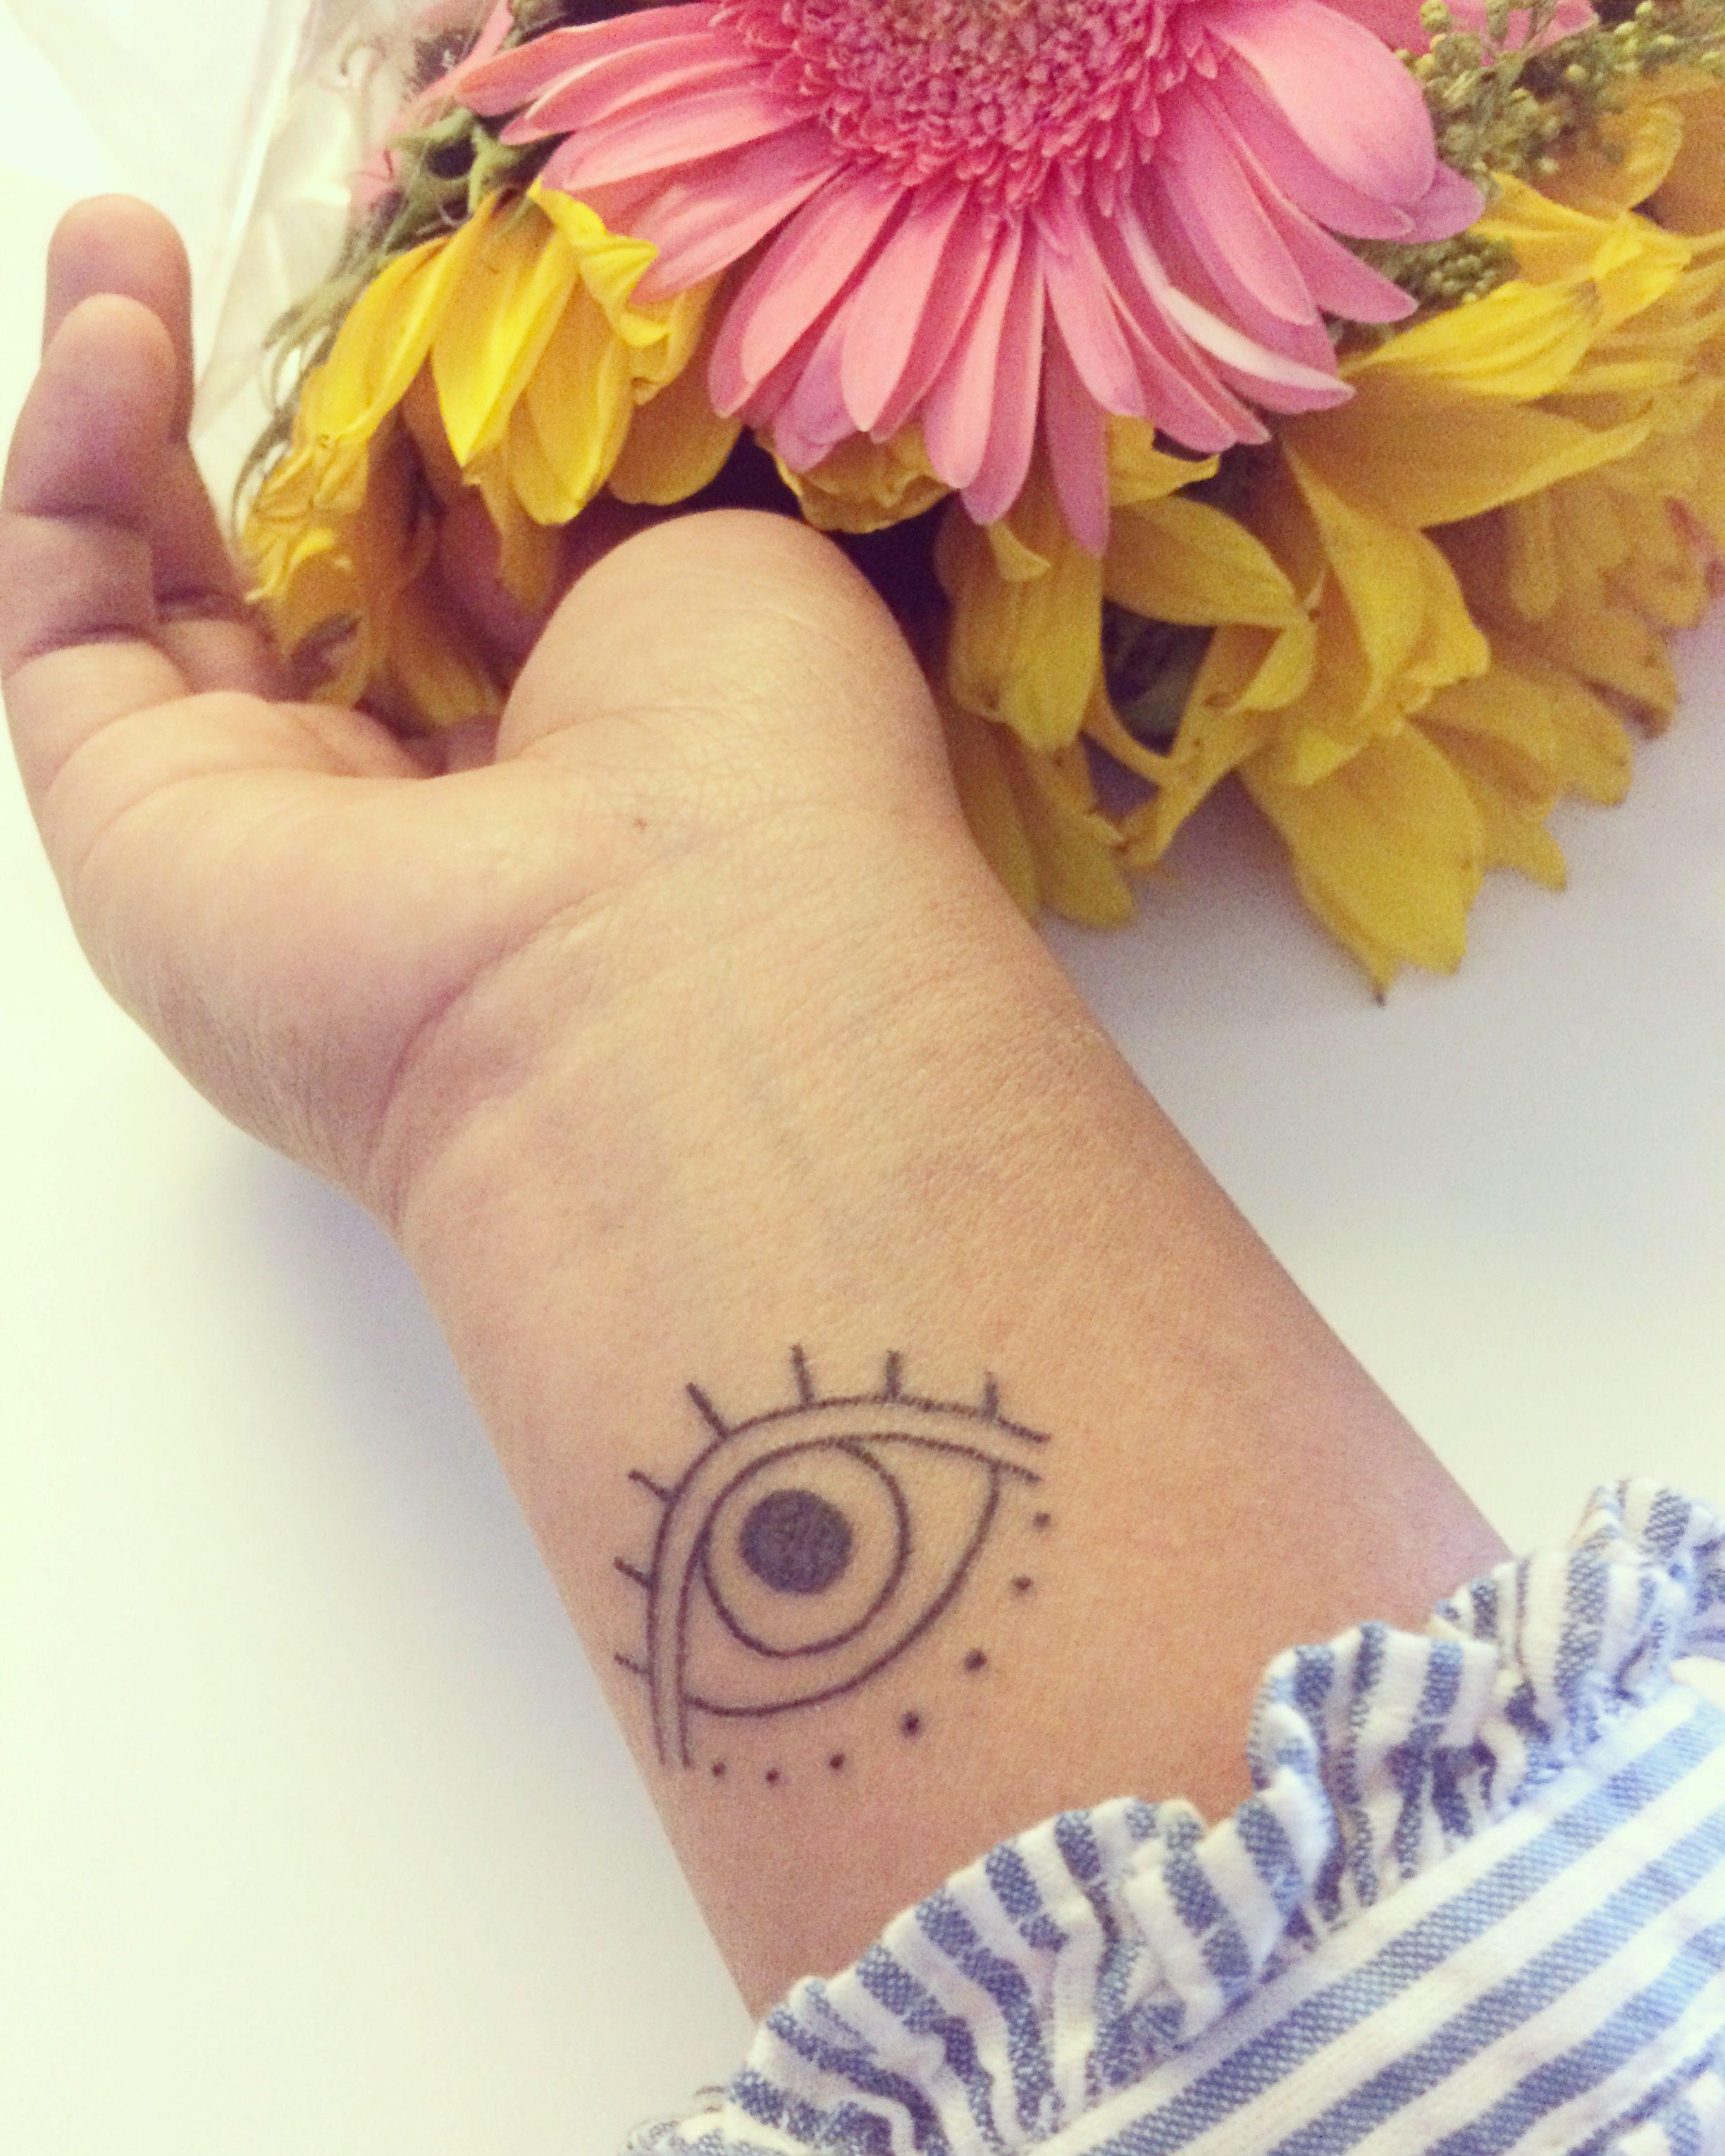 Tatuaje Minimalista De Ojo Bohemia India Tatuaje Ojo Ojo Tatuaje Tatuajes Minimalistas